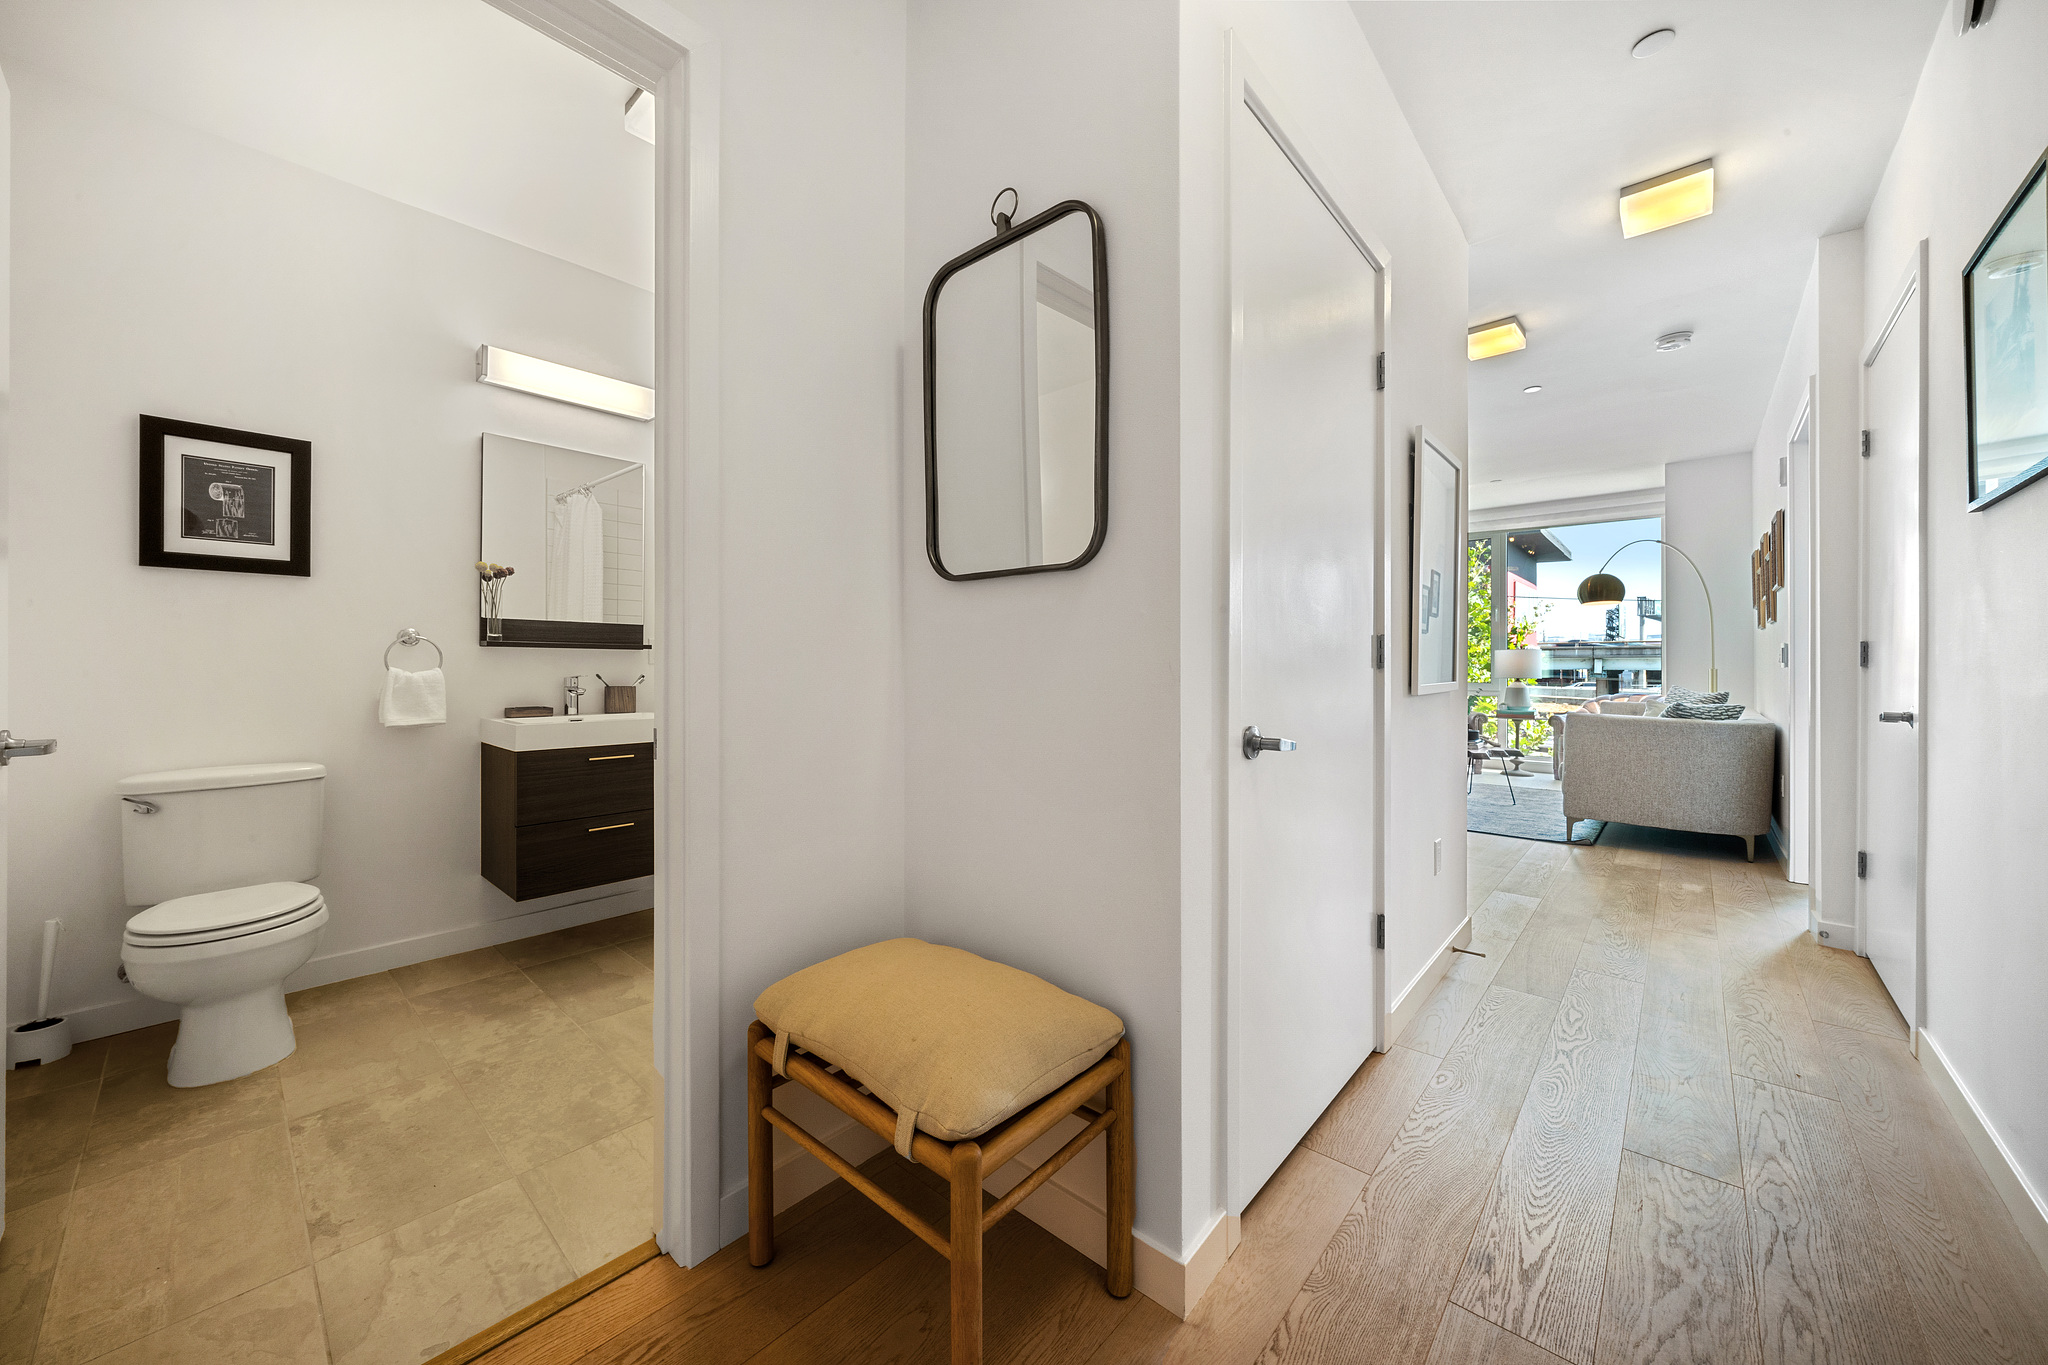 Hallway and Bathroom - SF Realty